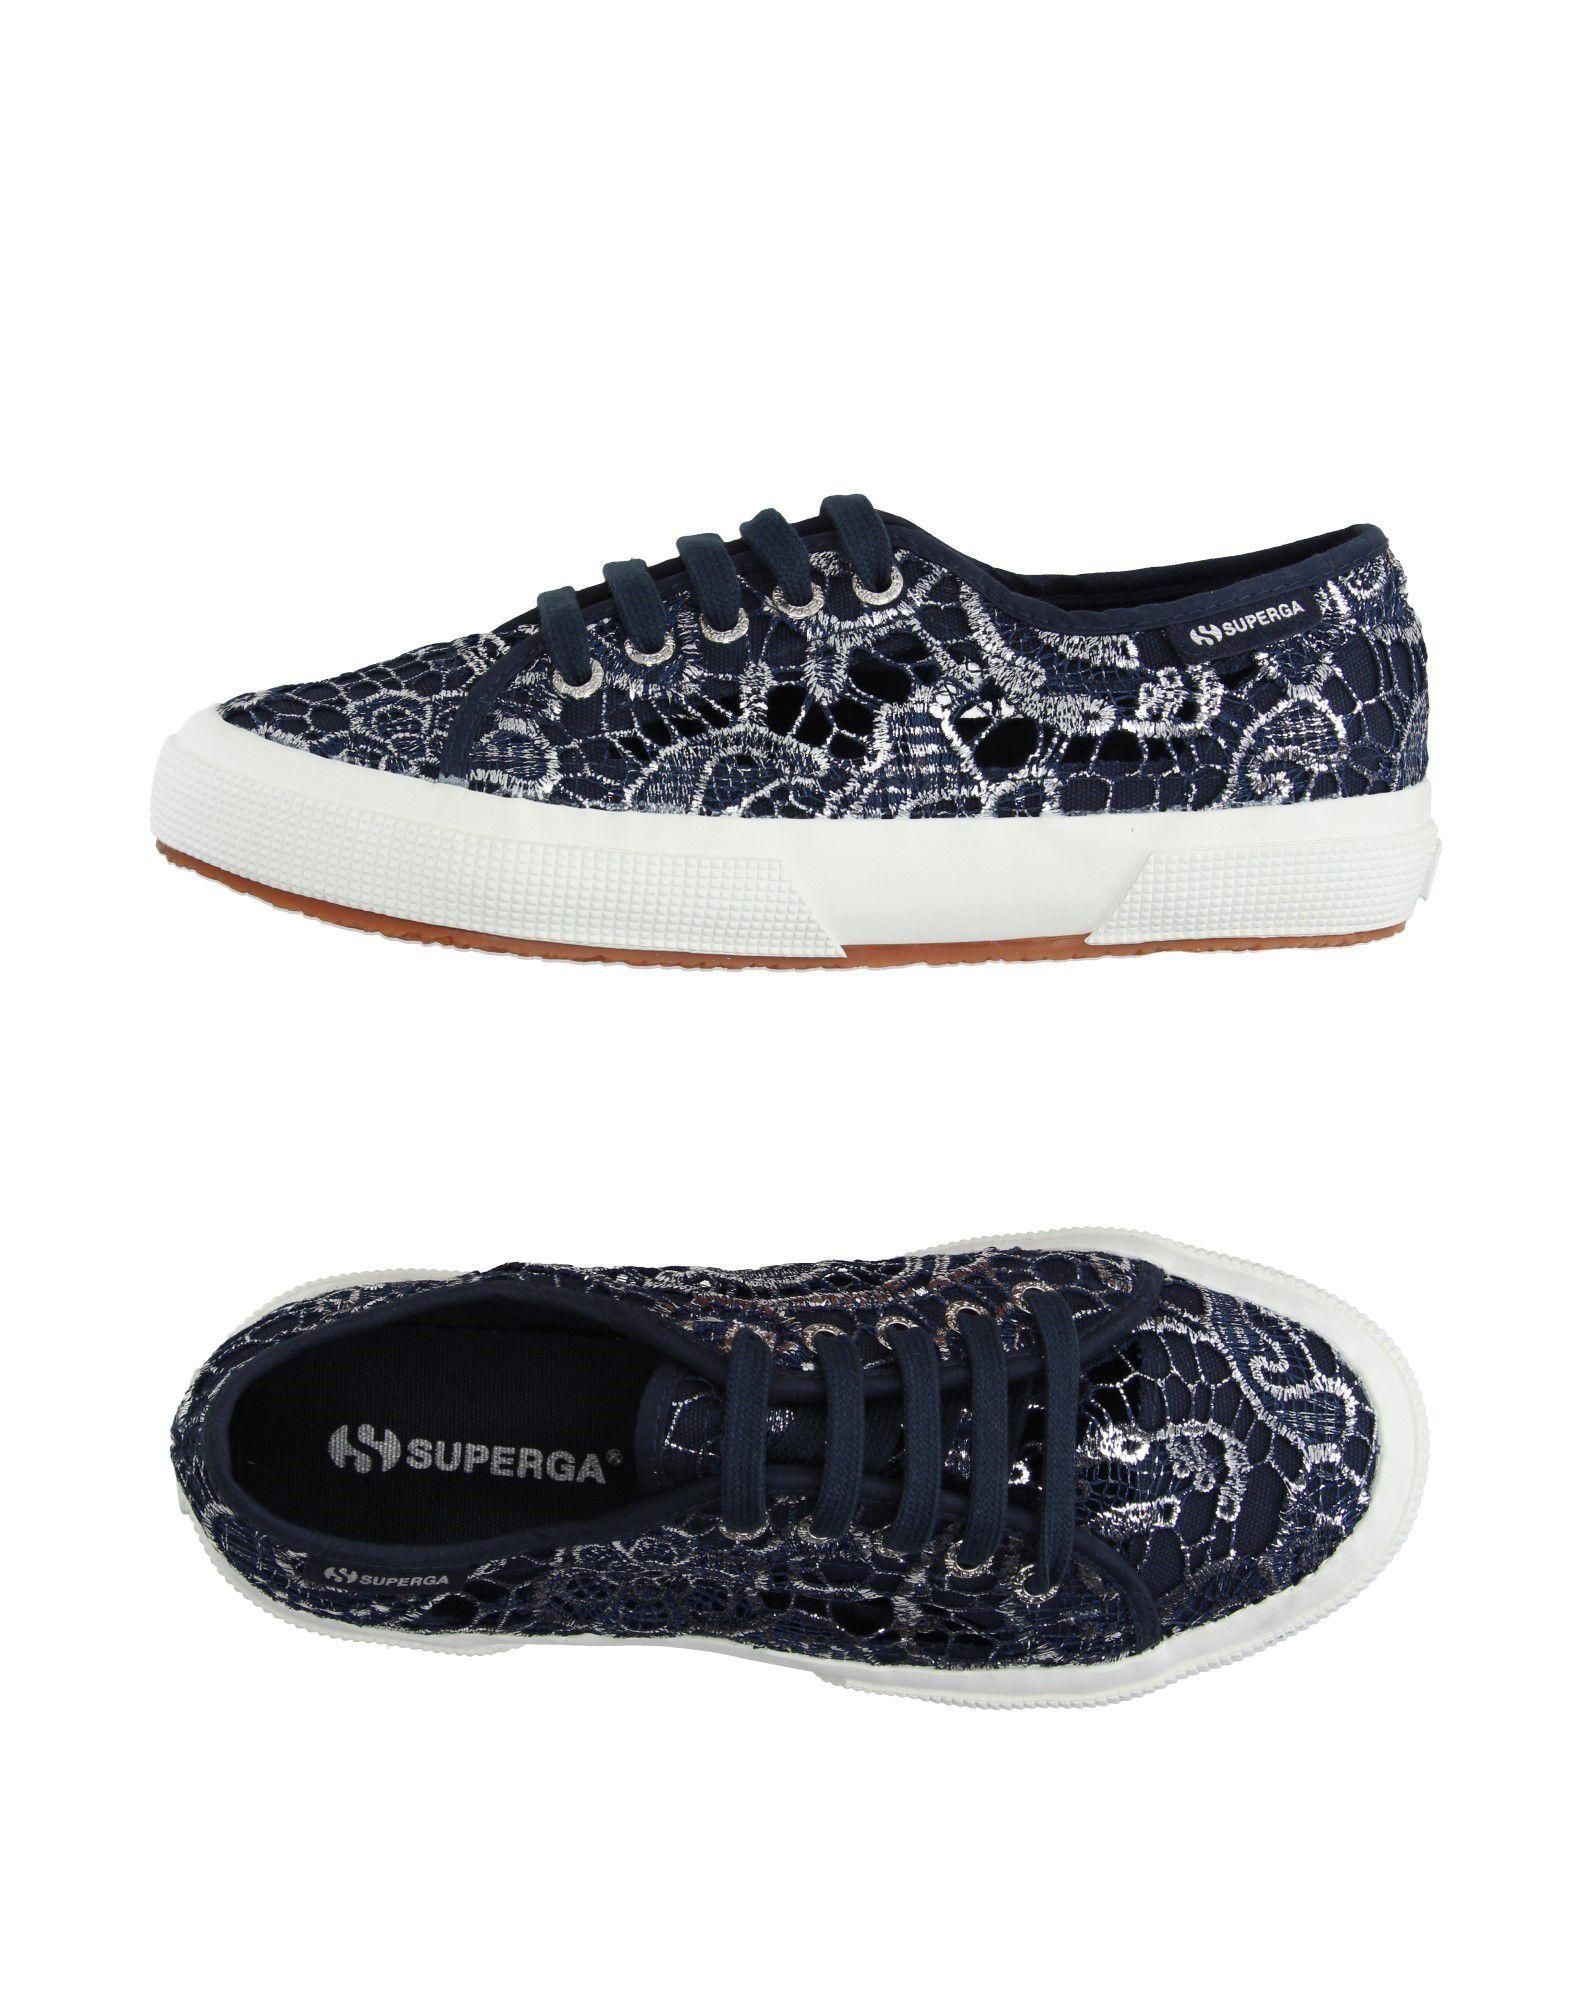 Superga® Sneakers Damen Qualität  11025685OV Gute Qualität Damen beliebte Schuhe 12cabb